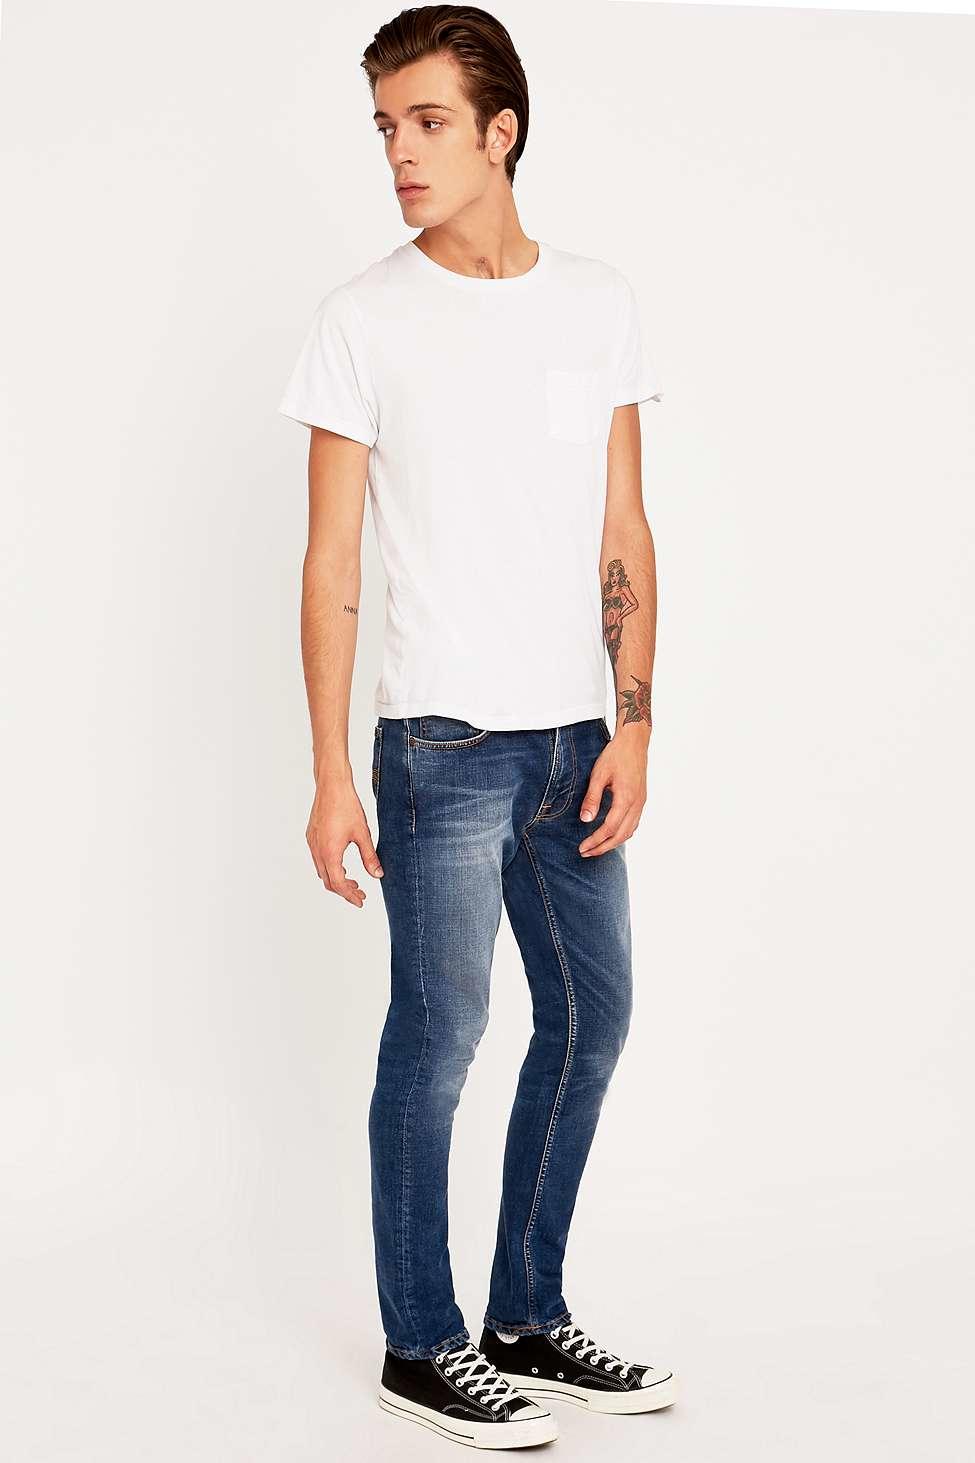 Nudie Jeans Denim Lean Dean Bay Blue Slim Fit Jeans for Men